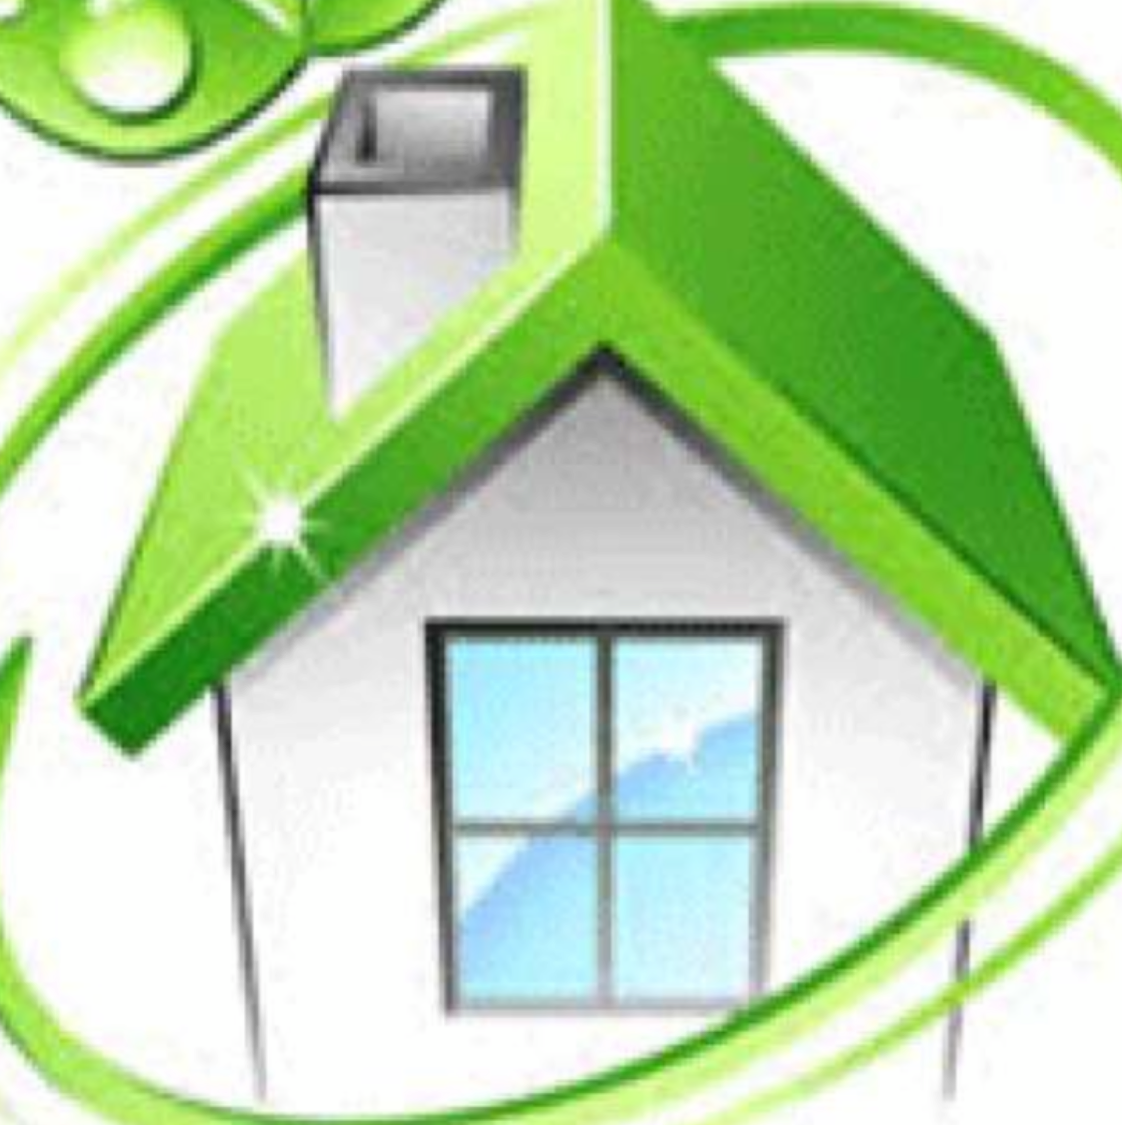 Woodbridge Home Exteriors: Majestic Maid Services Reviews - Woodbridge, VA